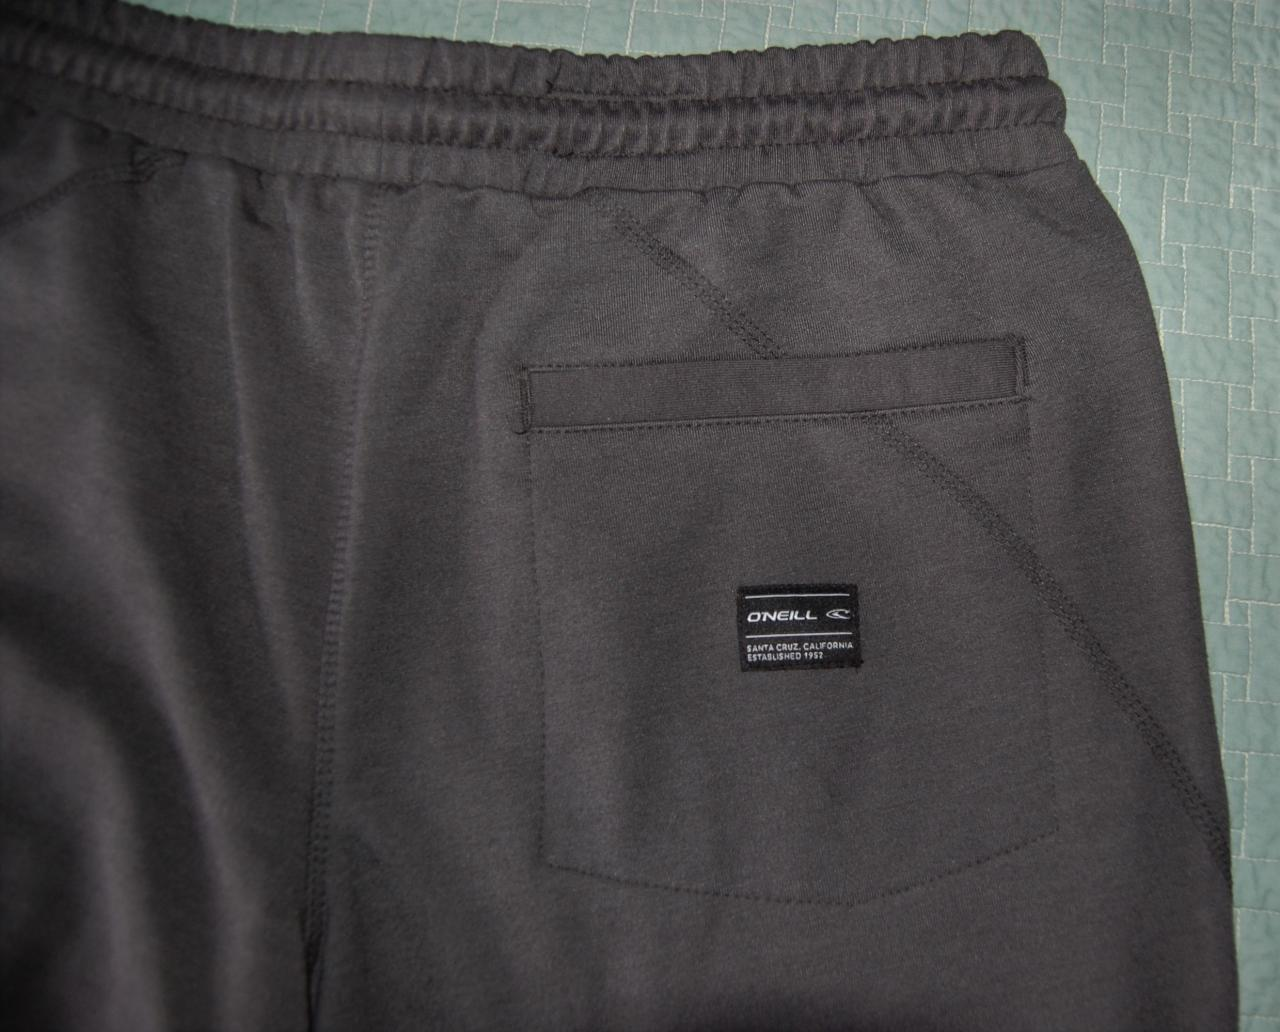 48e6058040 NWOT O'Neill Outrider Fleece Shorts, Slate Gray, Men's Small ...